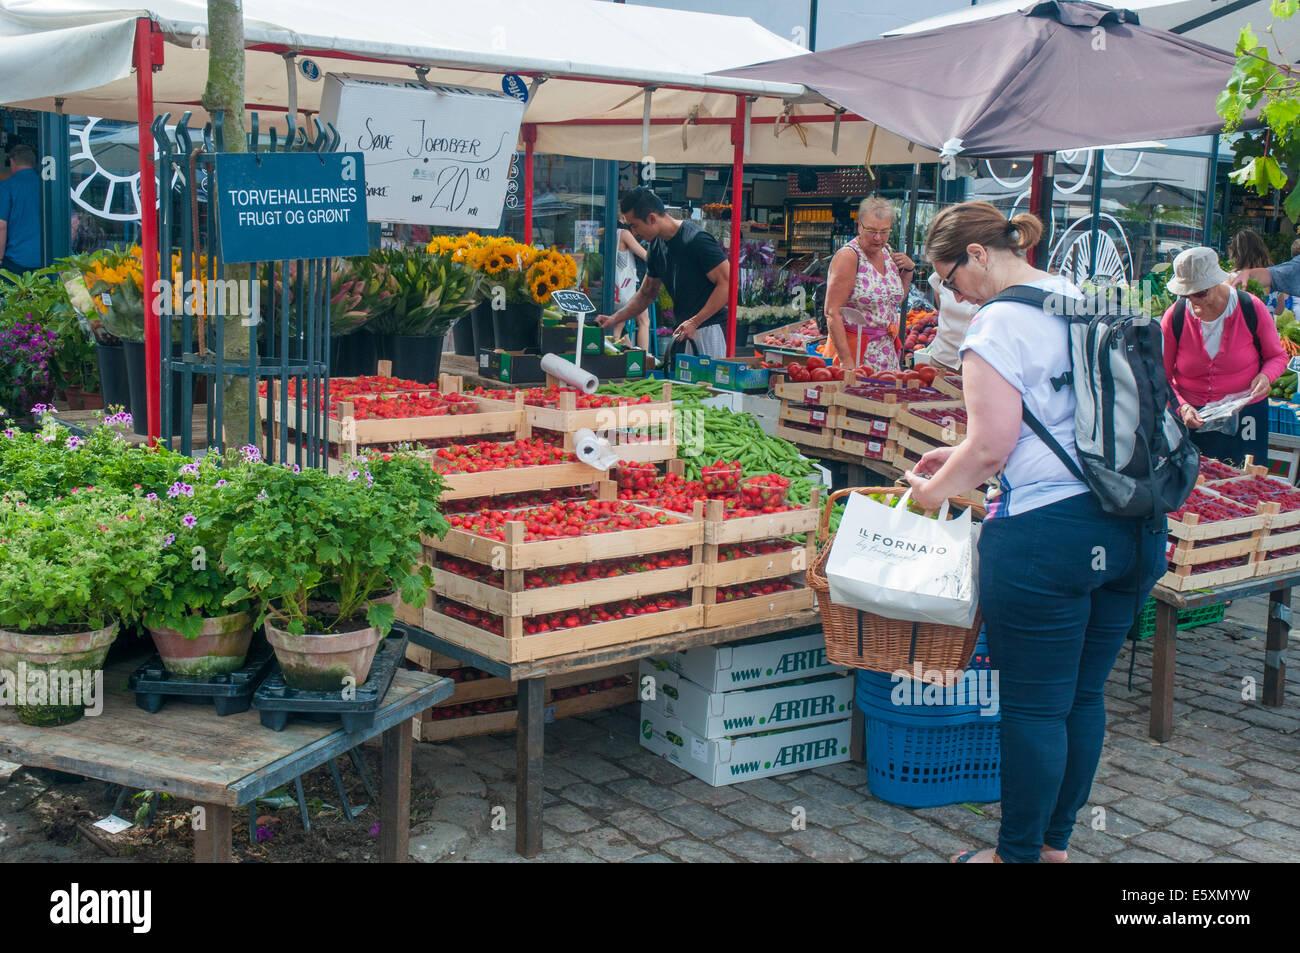 Torvehallerne covered food market, Copenhagen - Stock Image